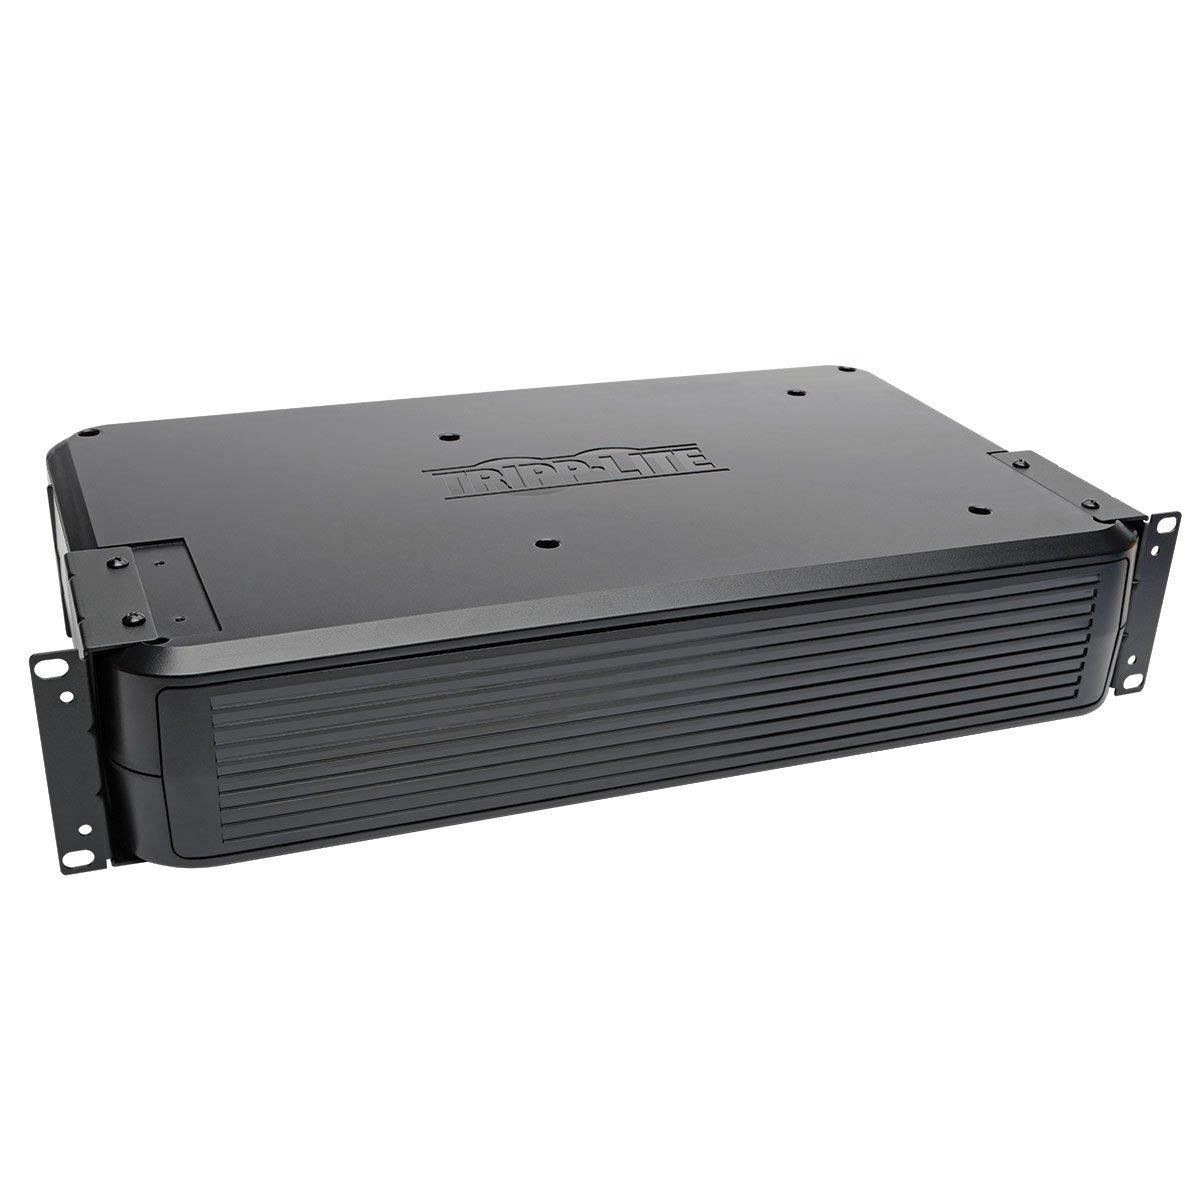 Tripp Lite BP24V15RT2U 24VDC UPS External Battery Pack for Select Tripp Lite UPS 2URM